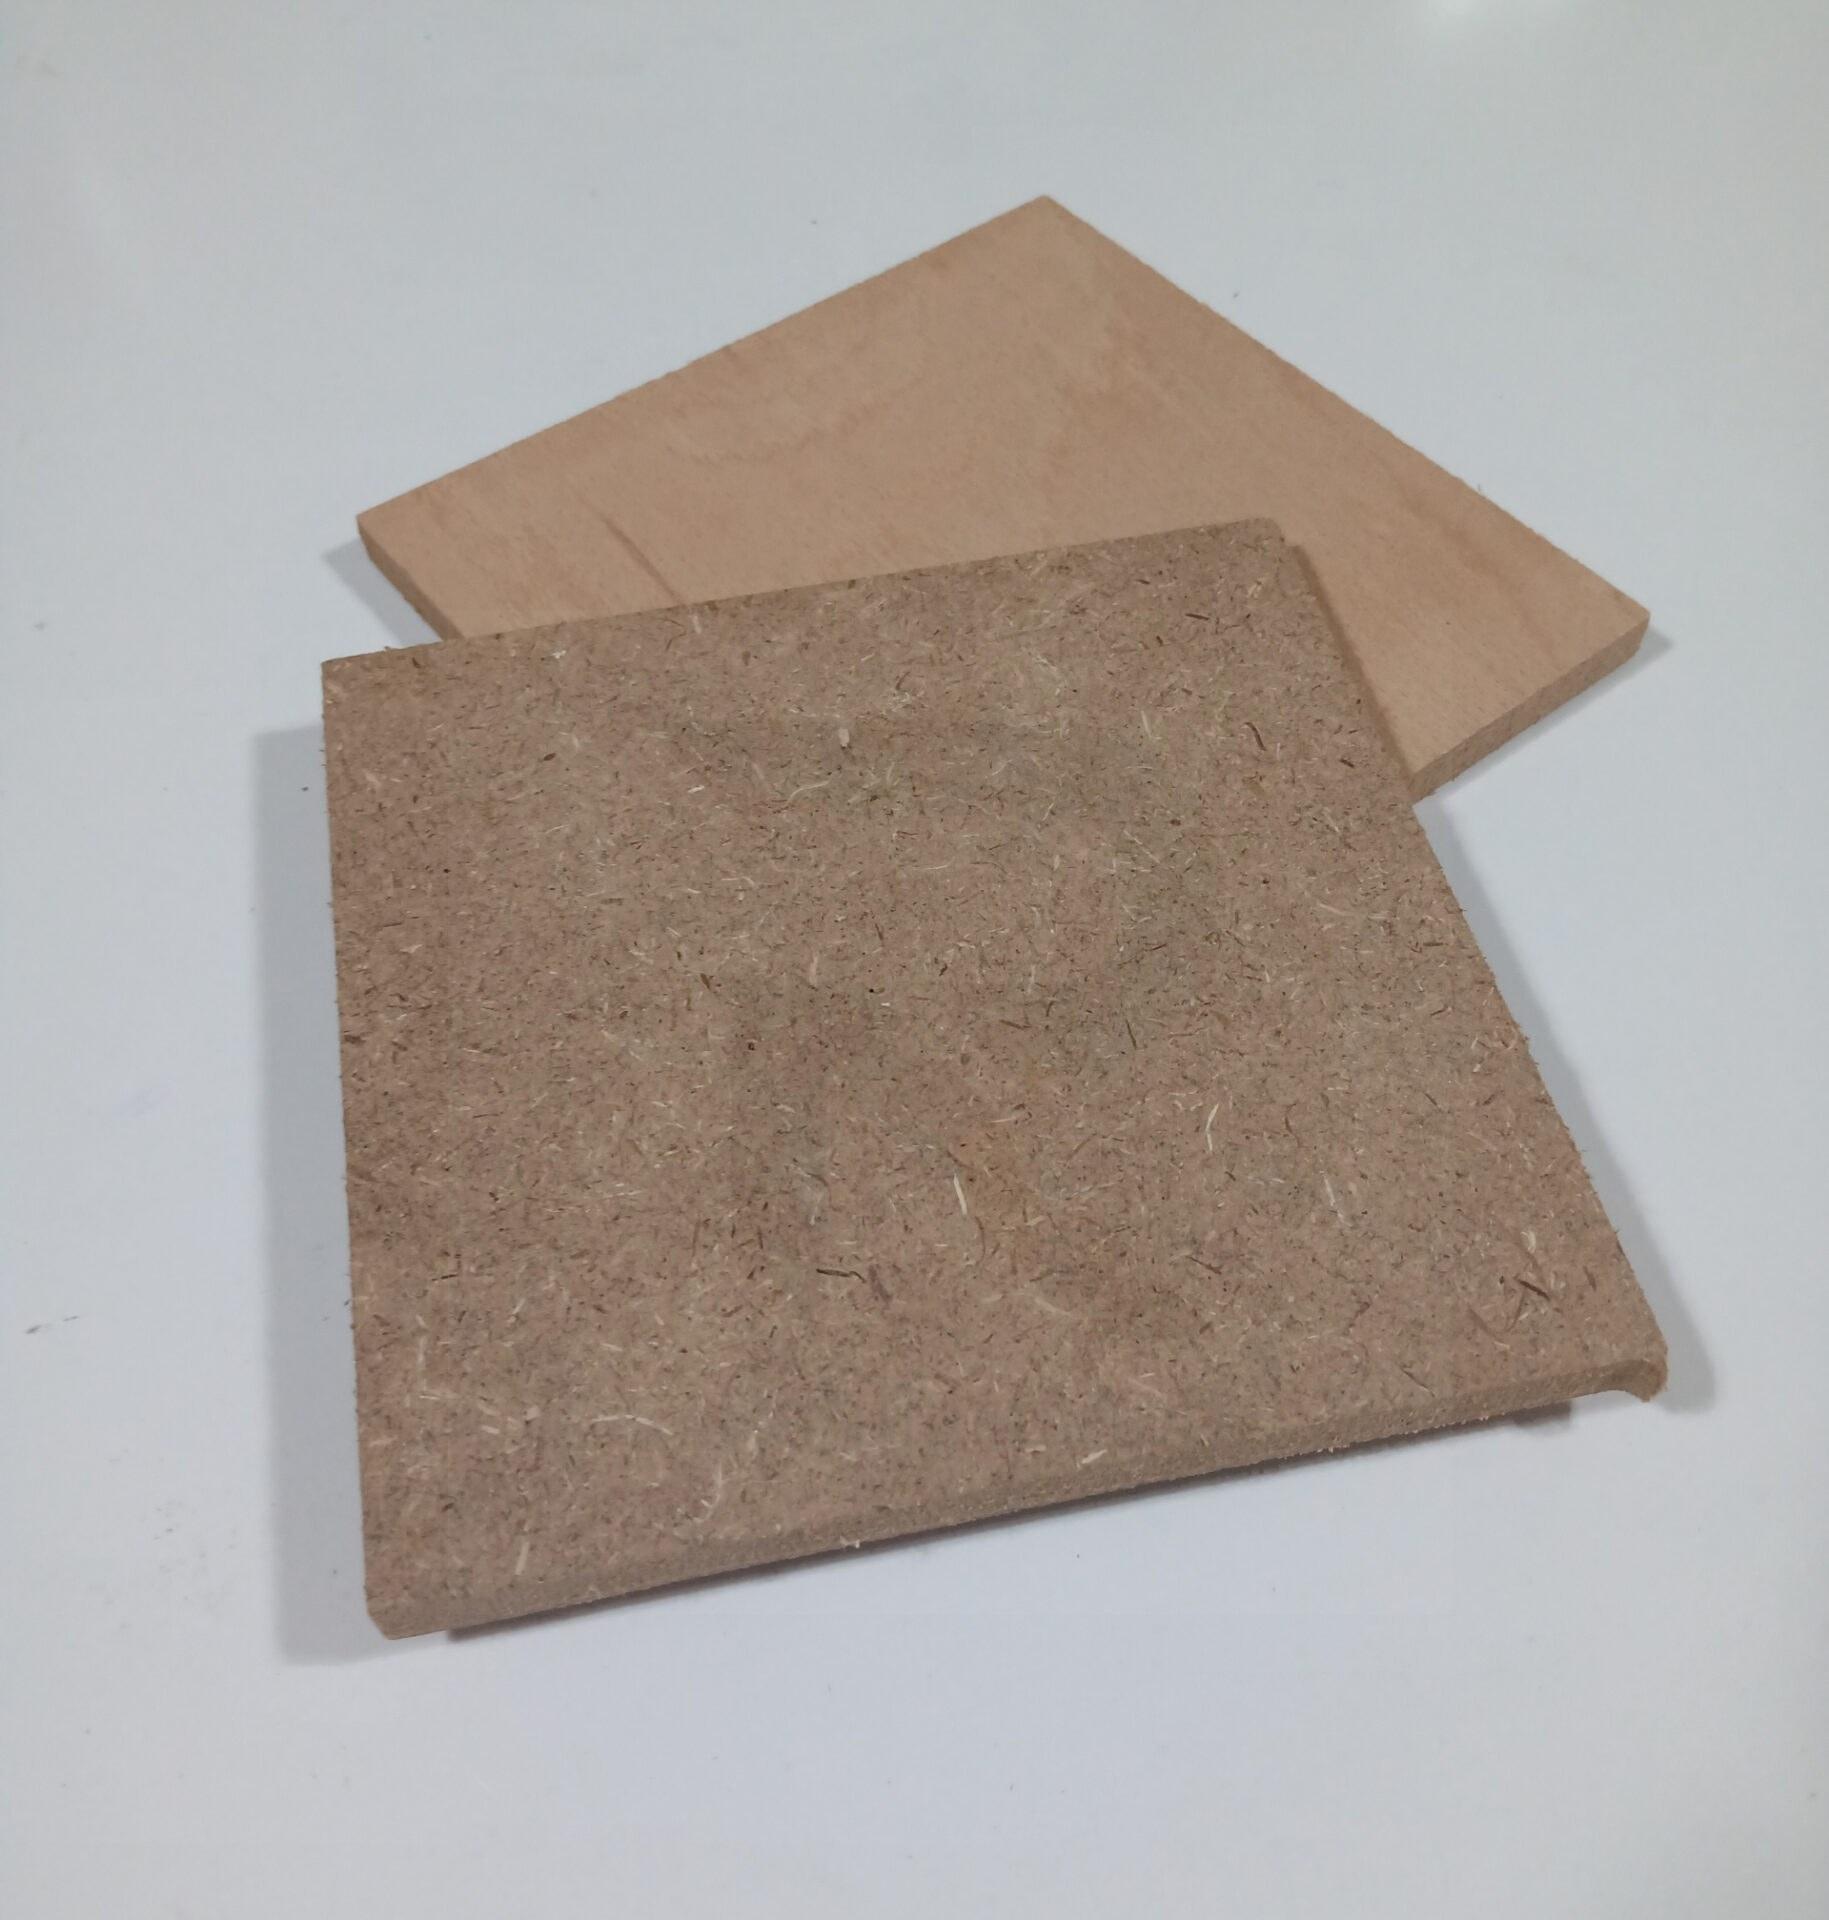 تصویر زیرلیوانی مربع